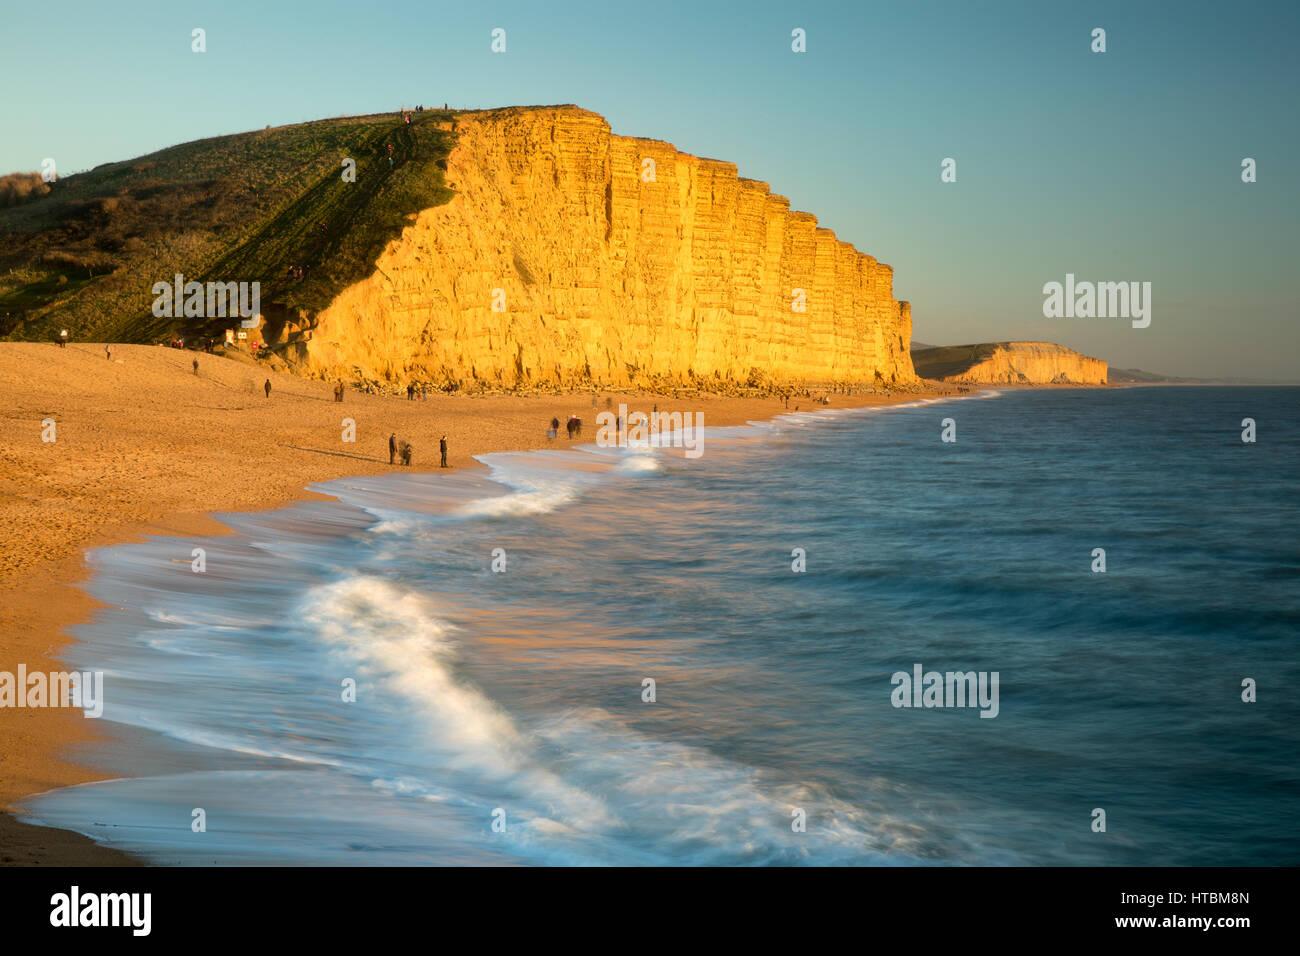 the beach below East Cliff, West Bay, Jurassic Coast, Dorset, England, UK - Stock Image